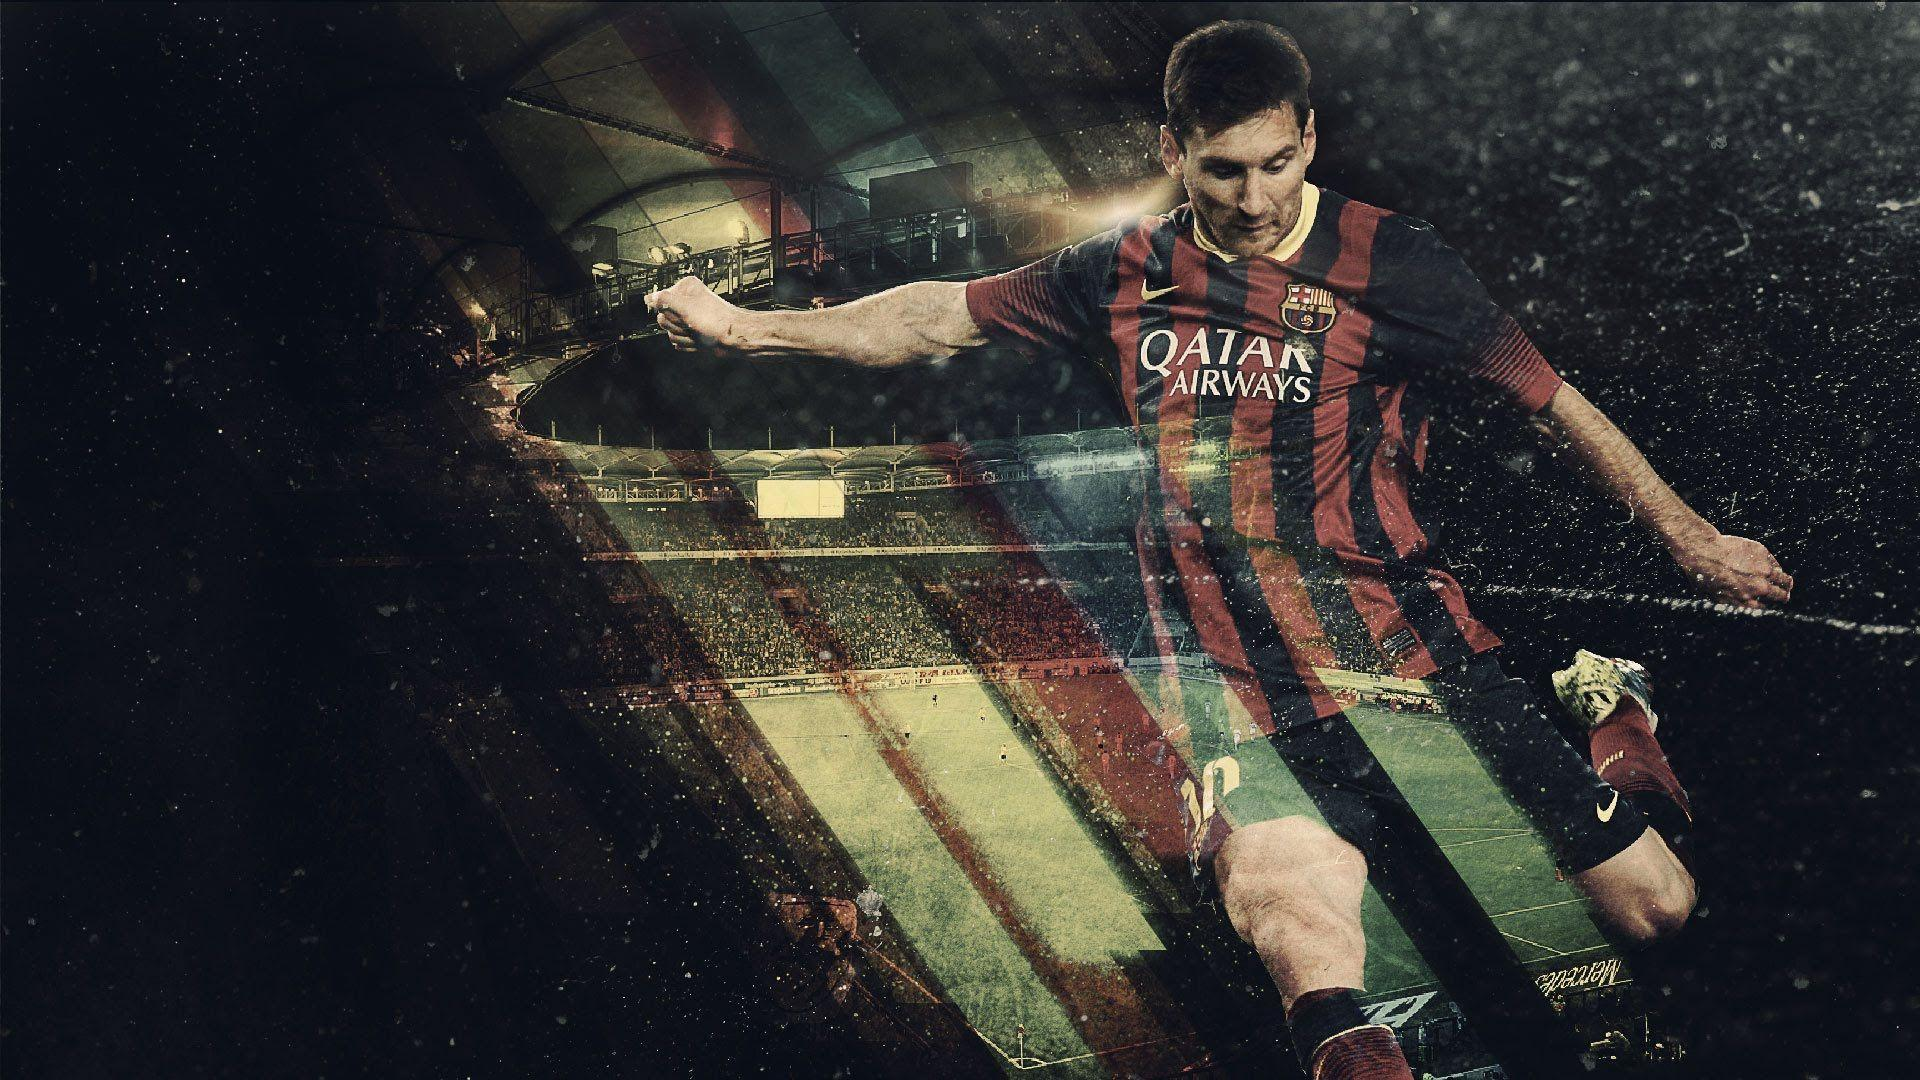 Football Wallpapers 4k Apk Download: Football Wallpaper: HD & 4K Football Wallpapers For